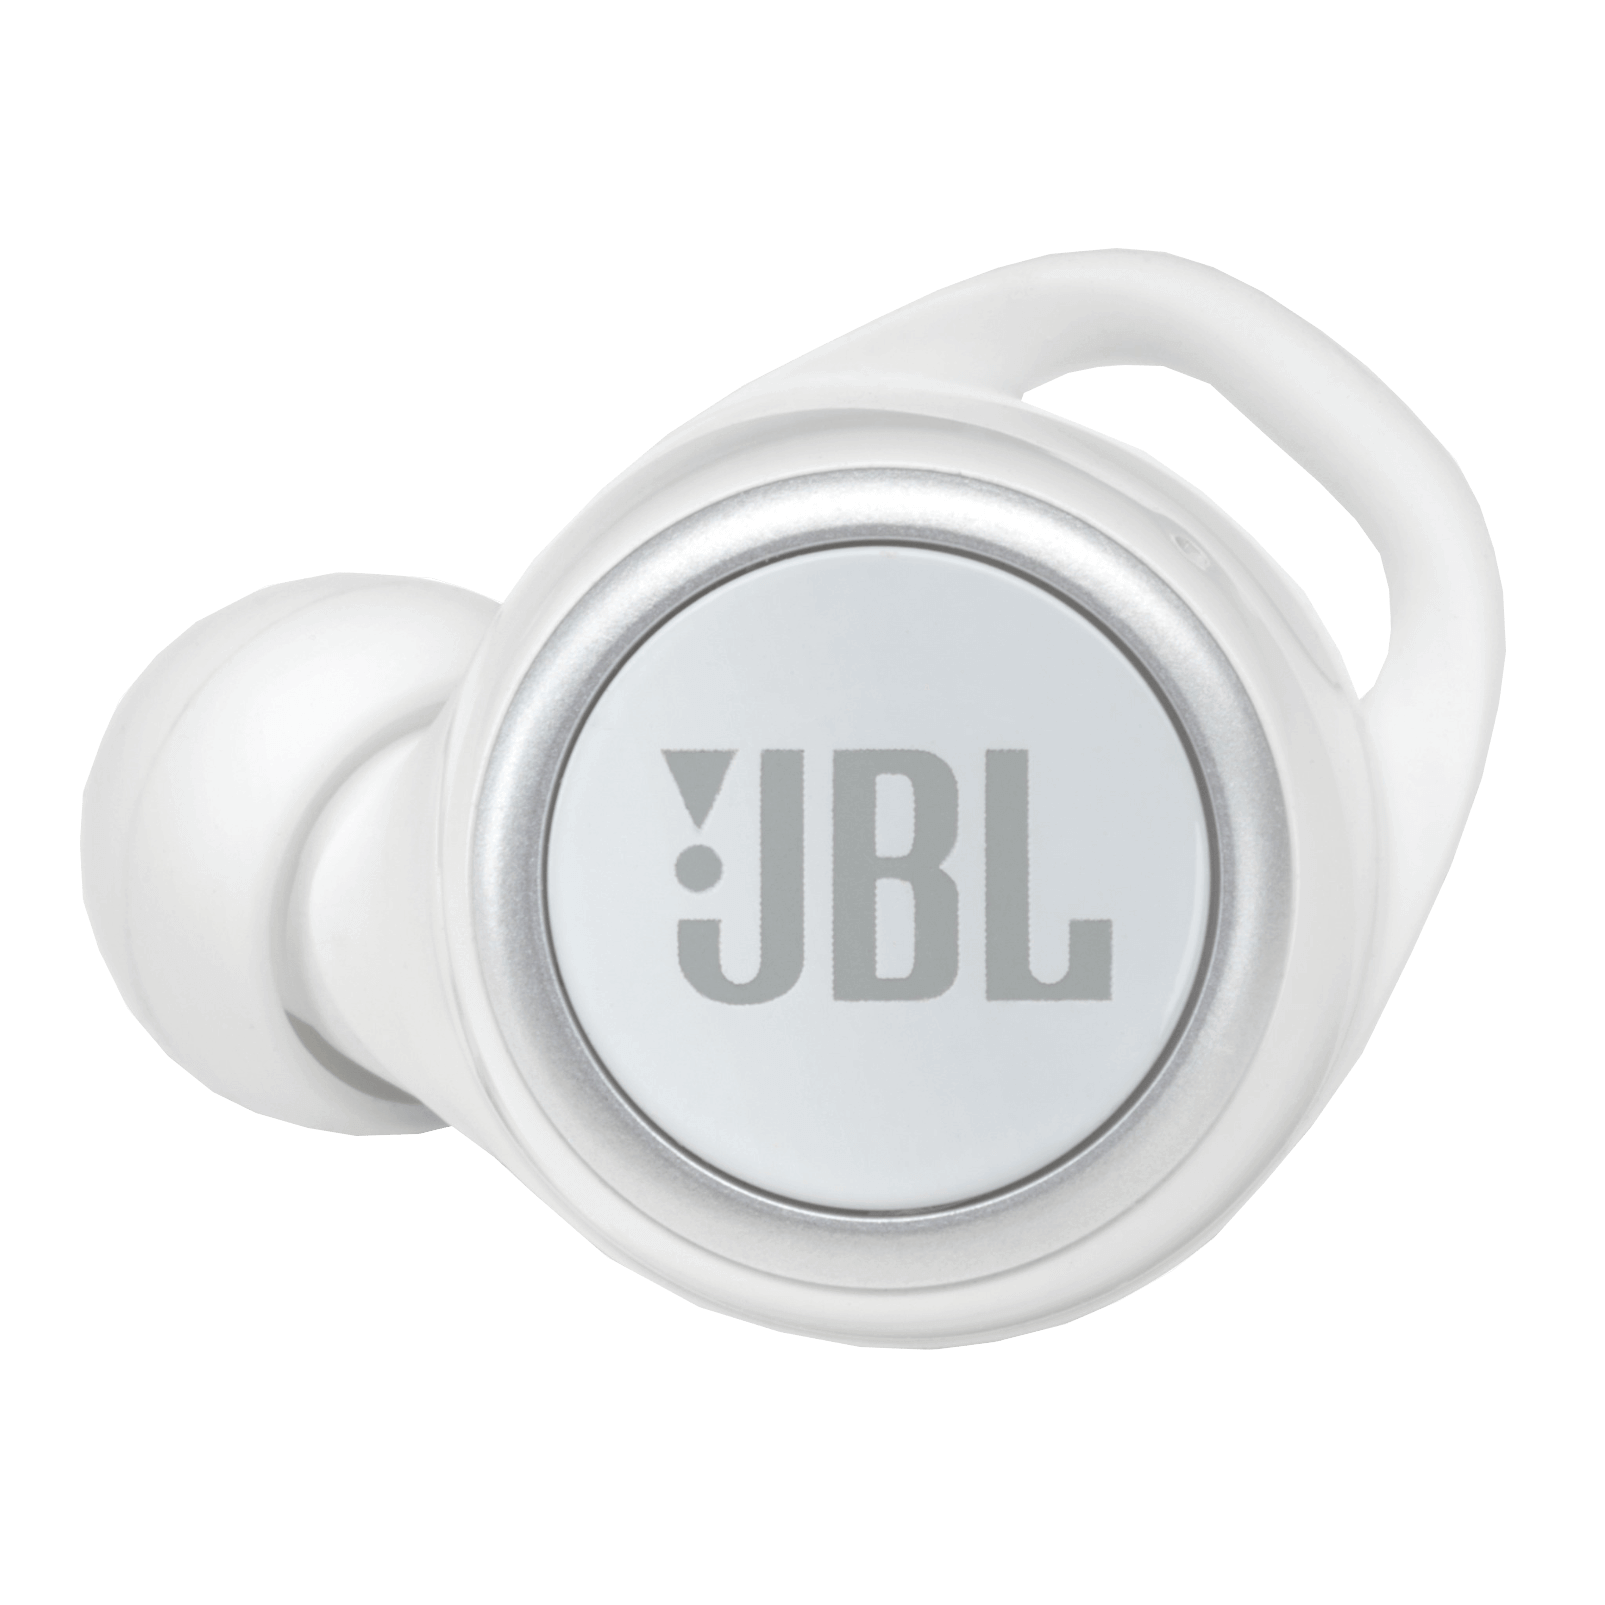 JBL Live 300TWS - White Gloss - True wireless earbuds - Detailshot 2